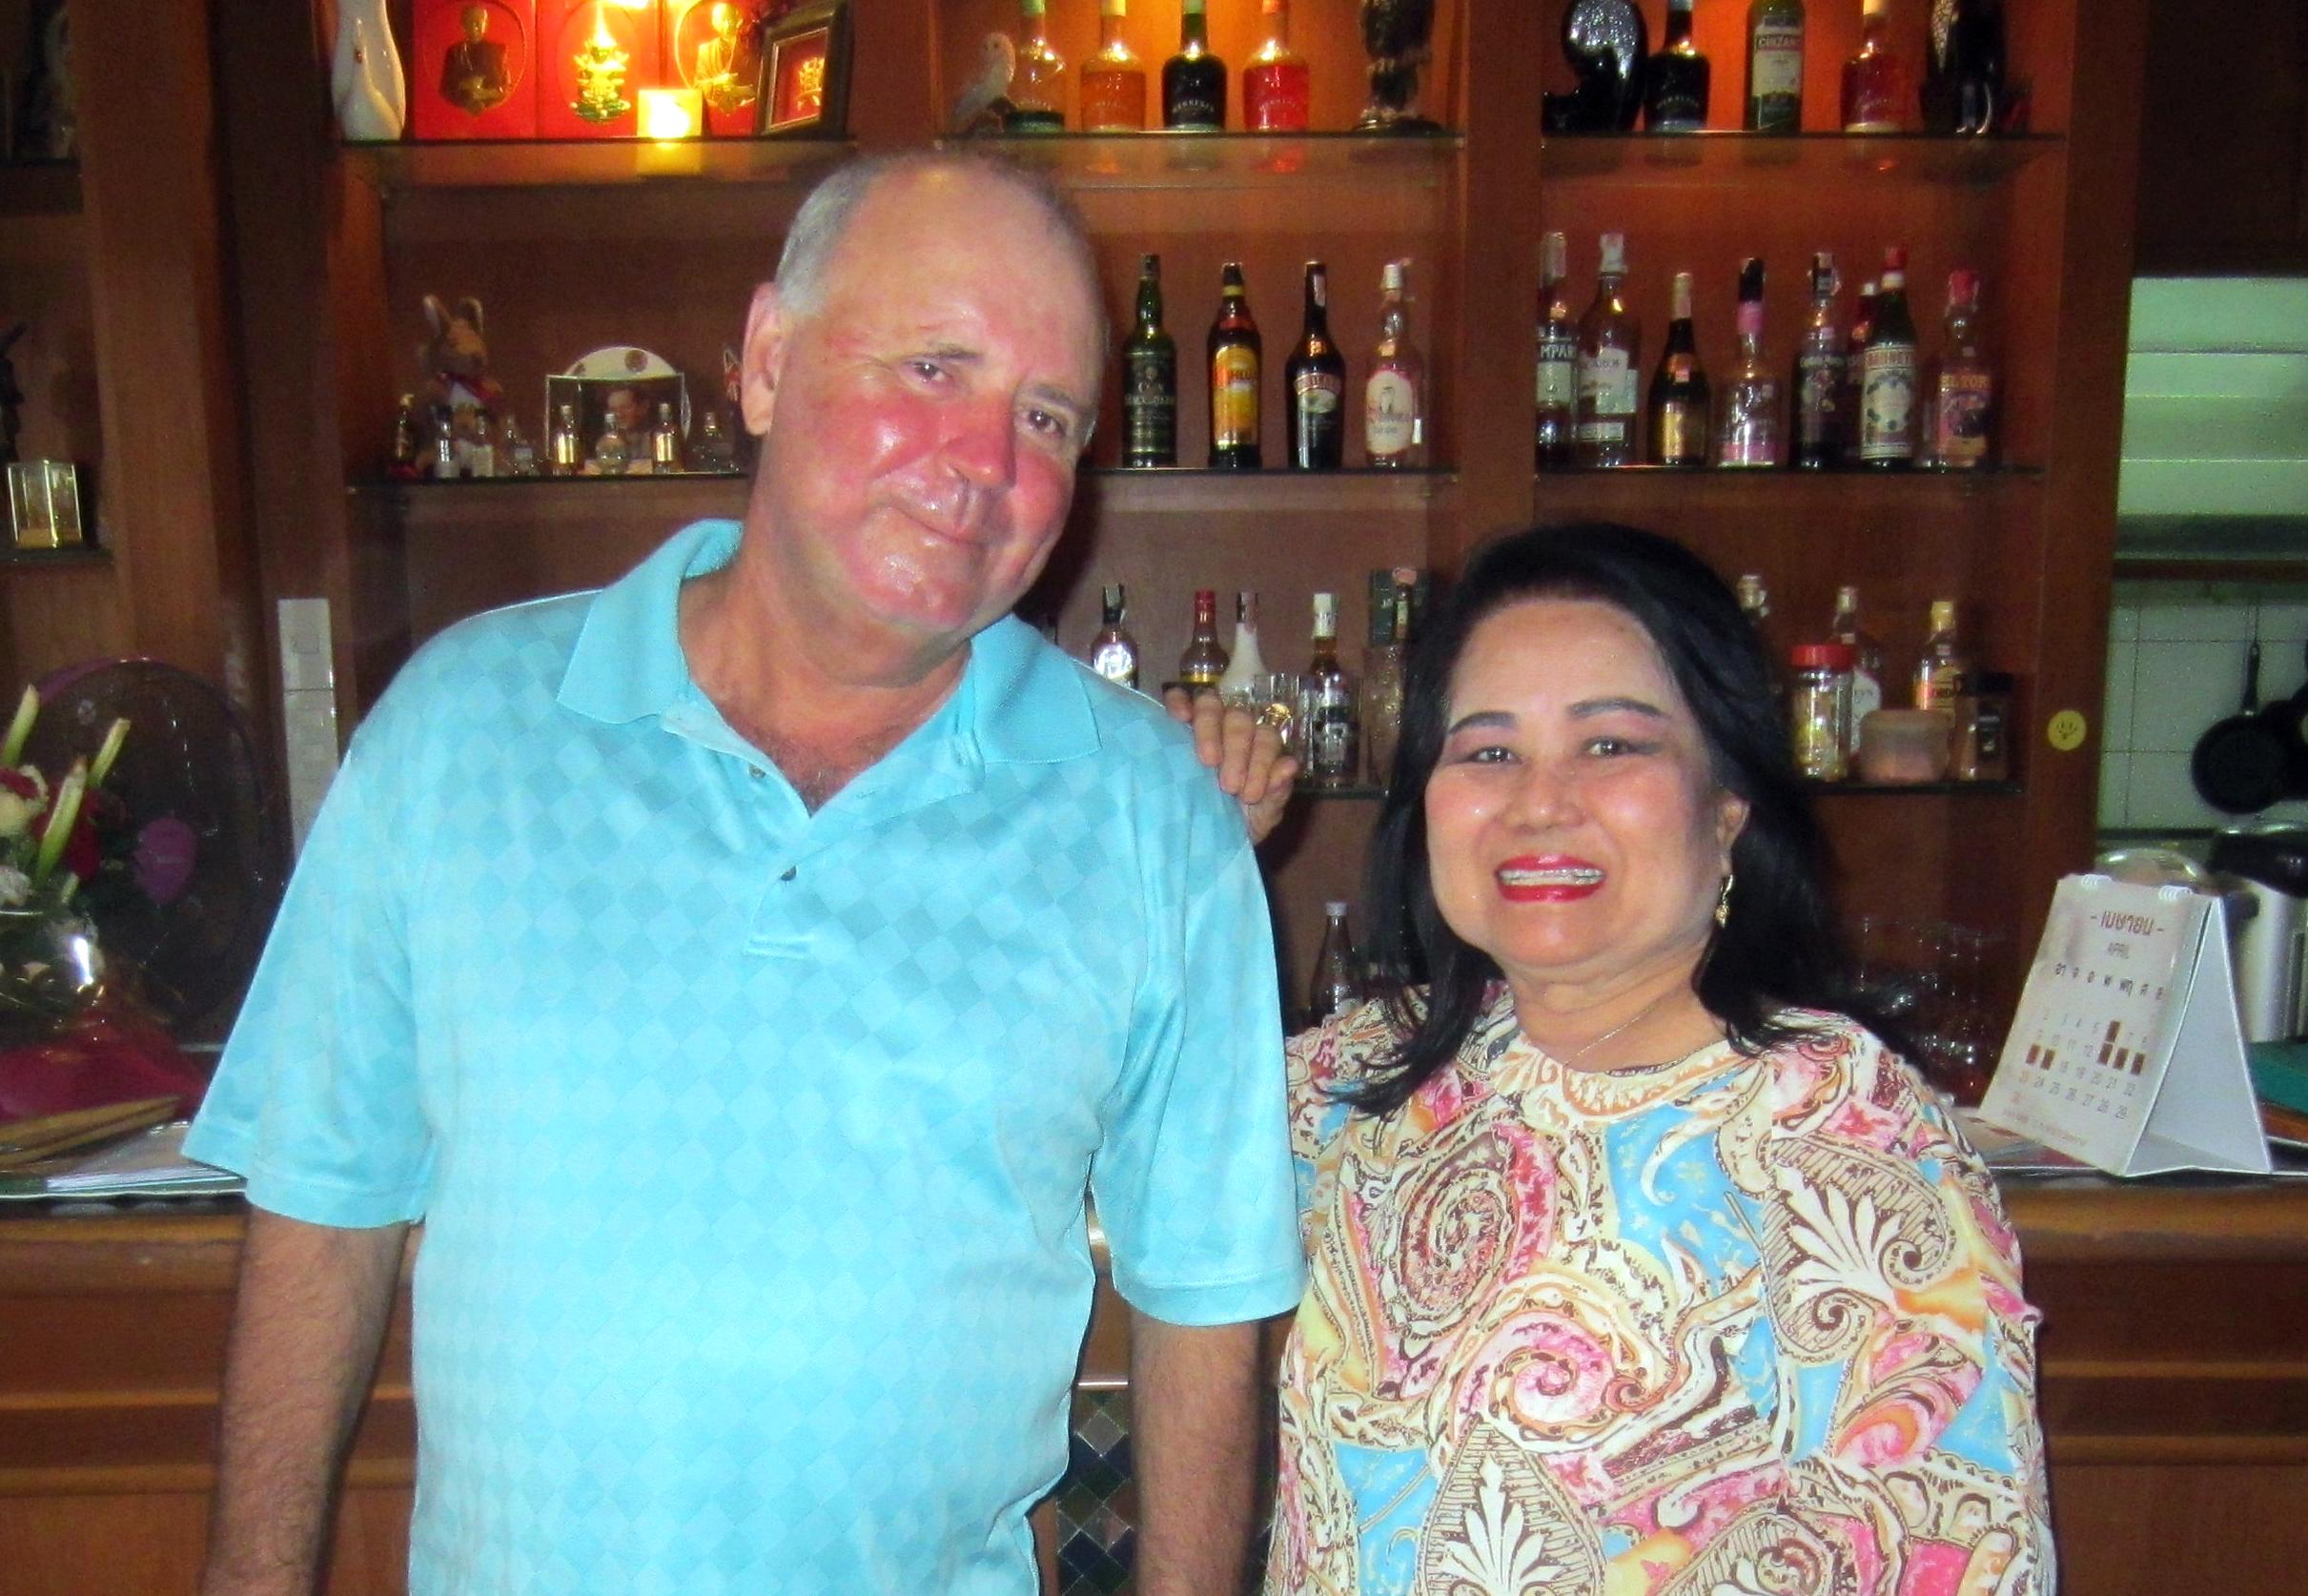 Bob Watson celebrates with birthday girl Lek.